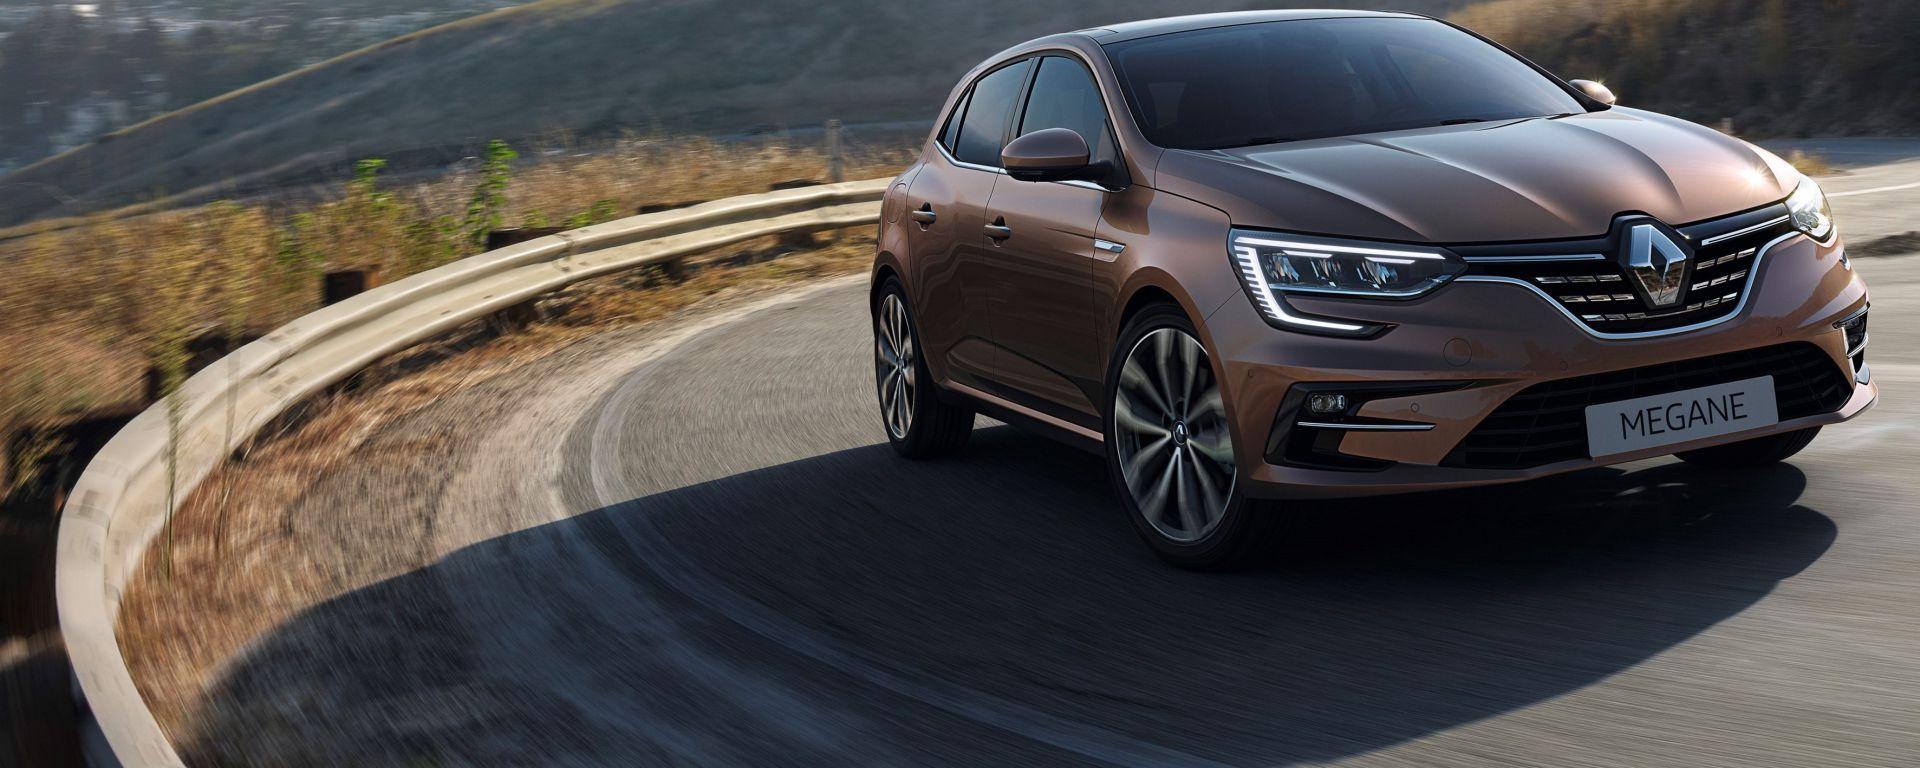 Nuova Renault Megane E-Tech: il frontale